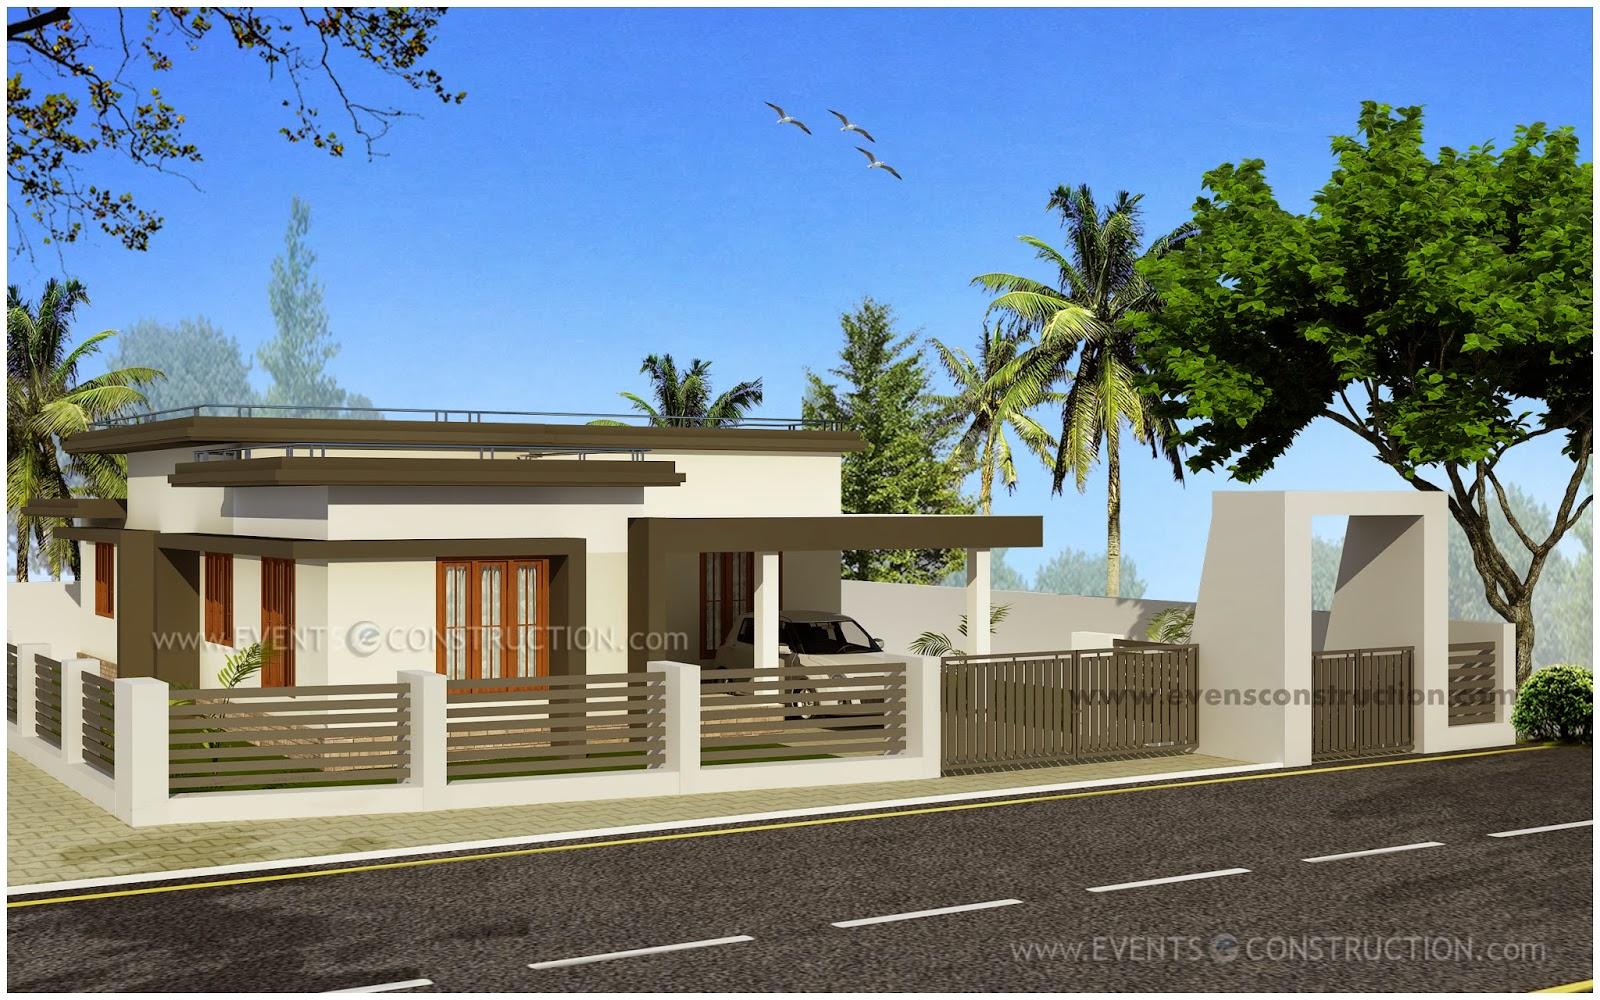 HDK  06. Evens Construction Pvt Ltd  NEW KERALA HOUSE SAMPLES 2013   3D